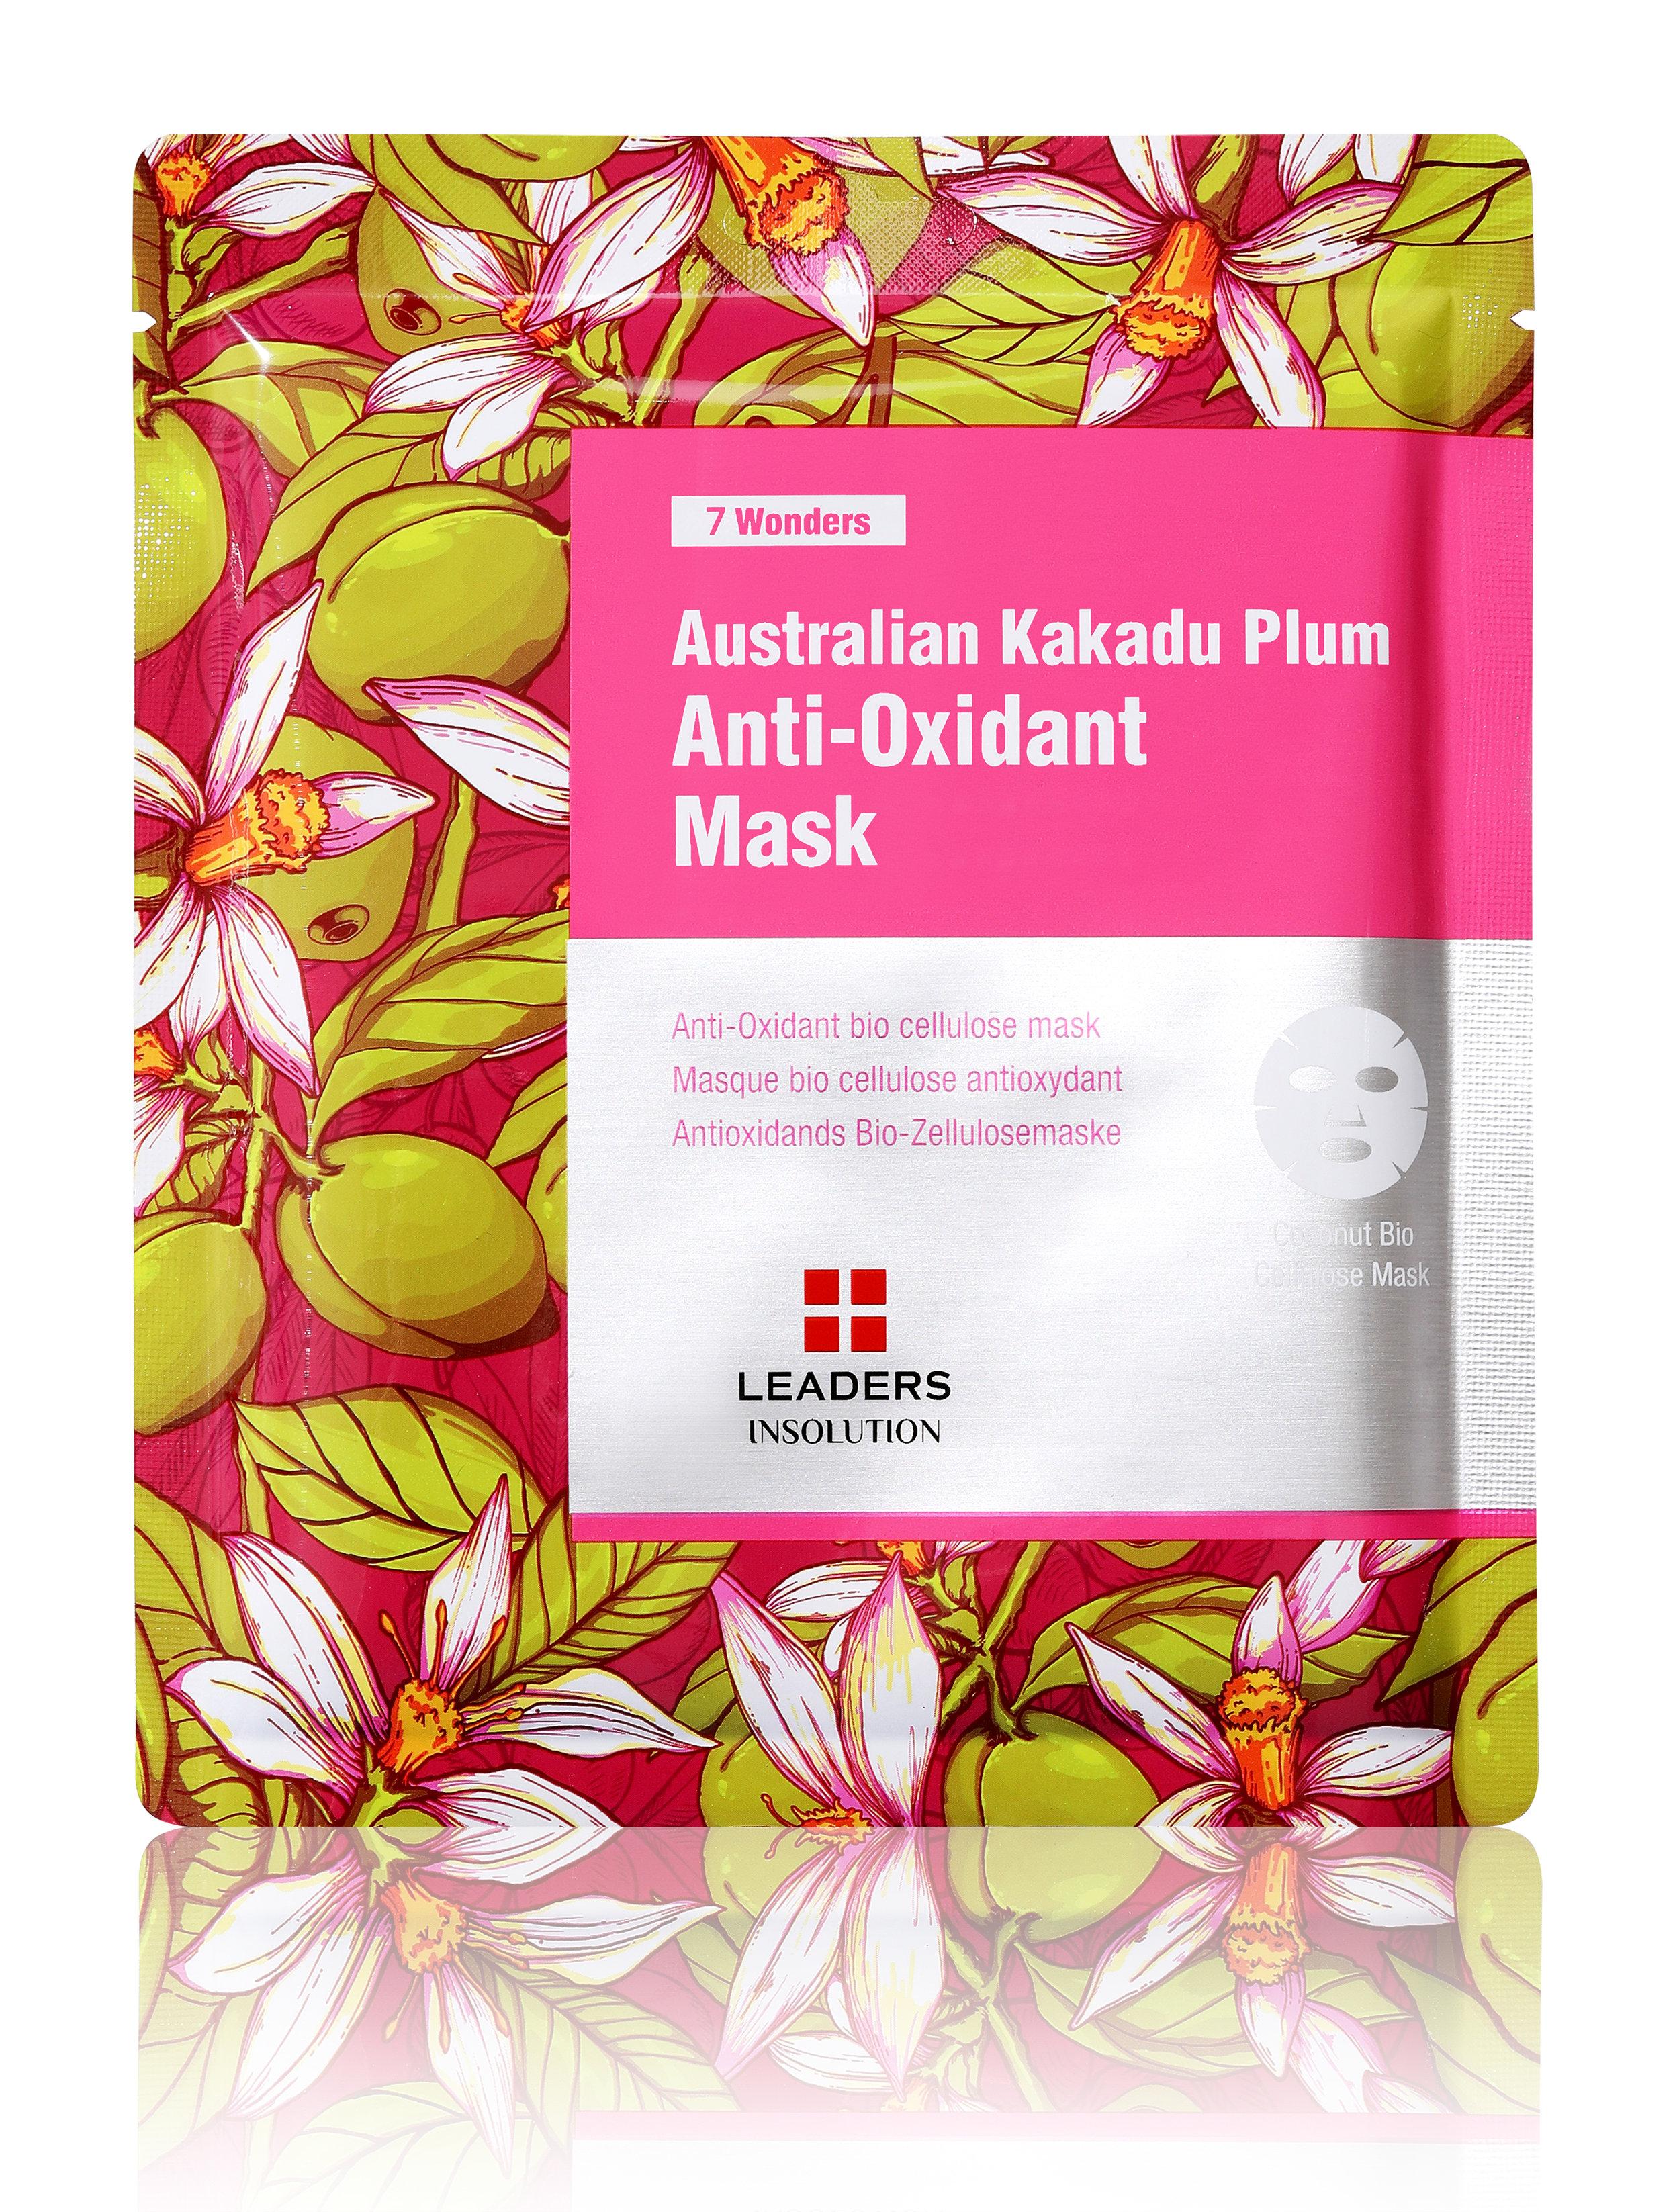 Insolution_7wonders_Australian kakadu plum_UNI_파우치_전면.jpg